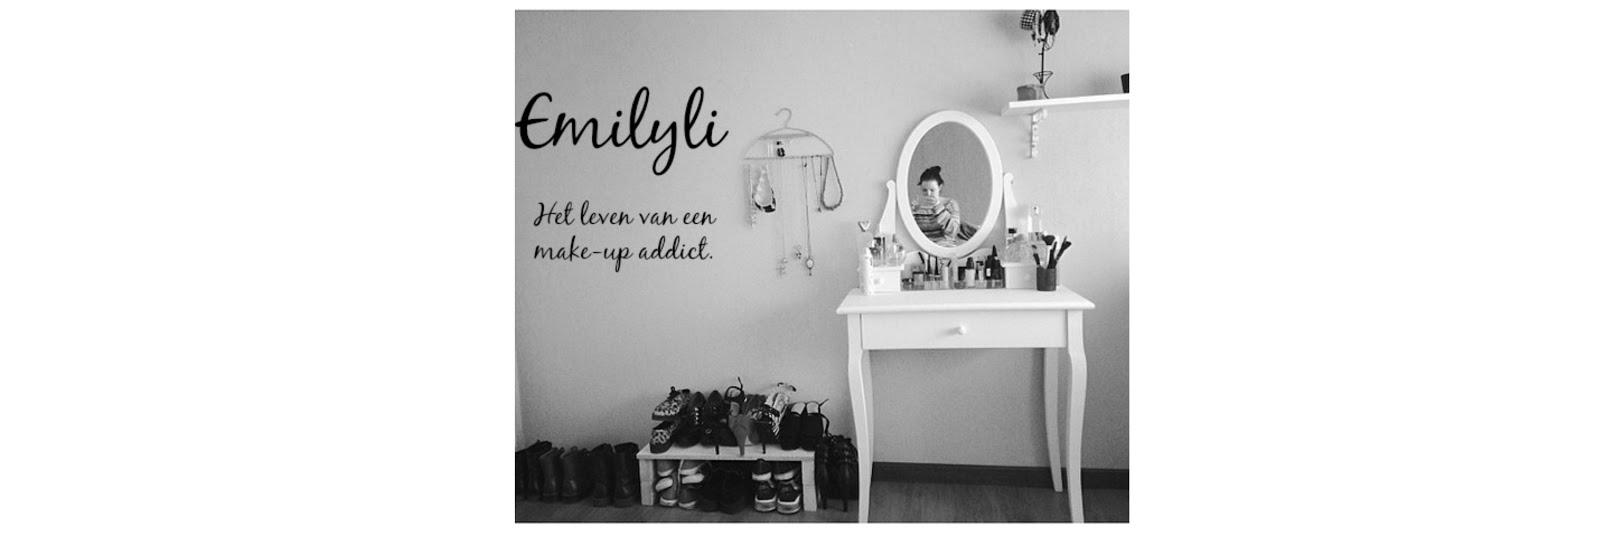 Emilyli